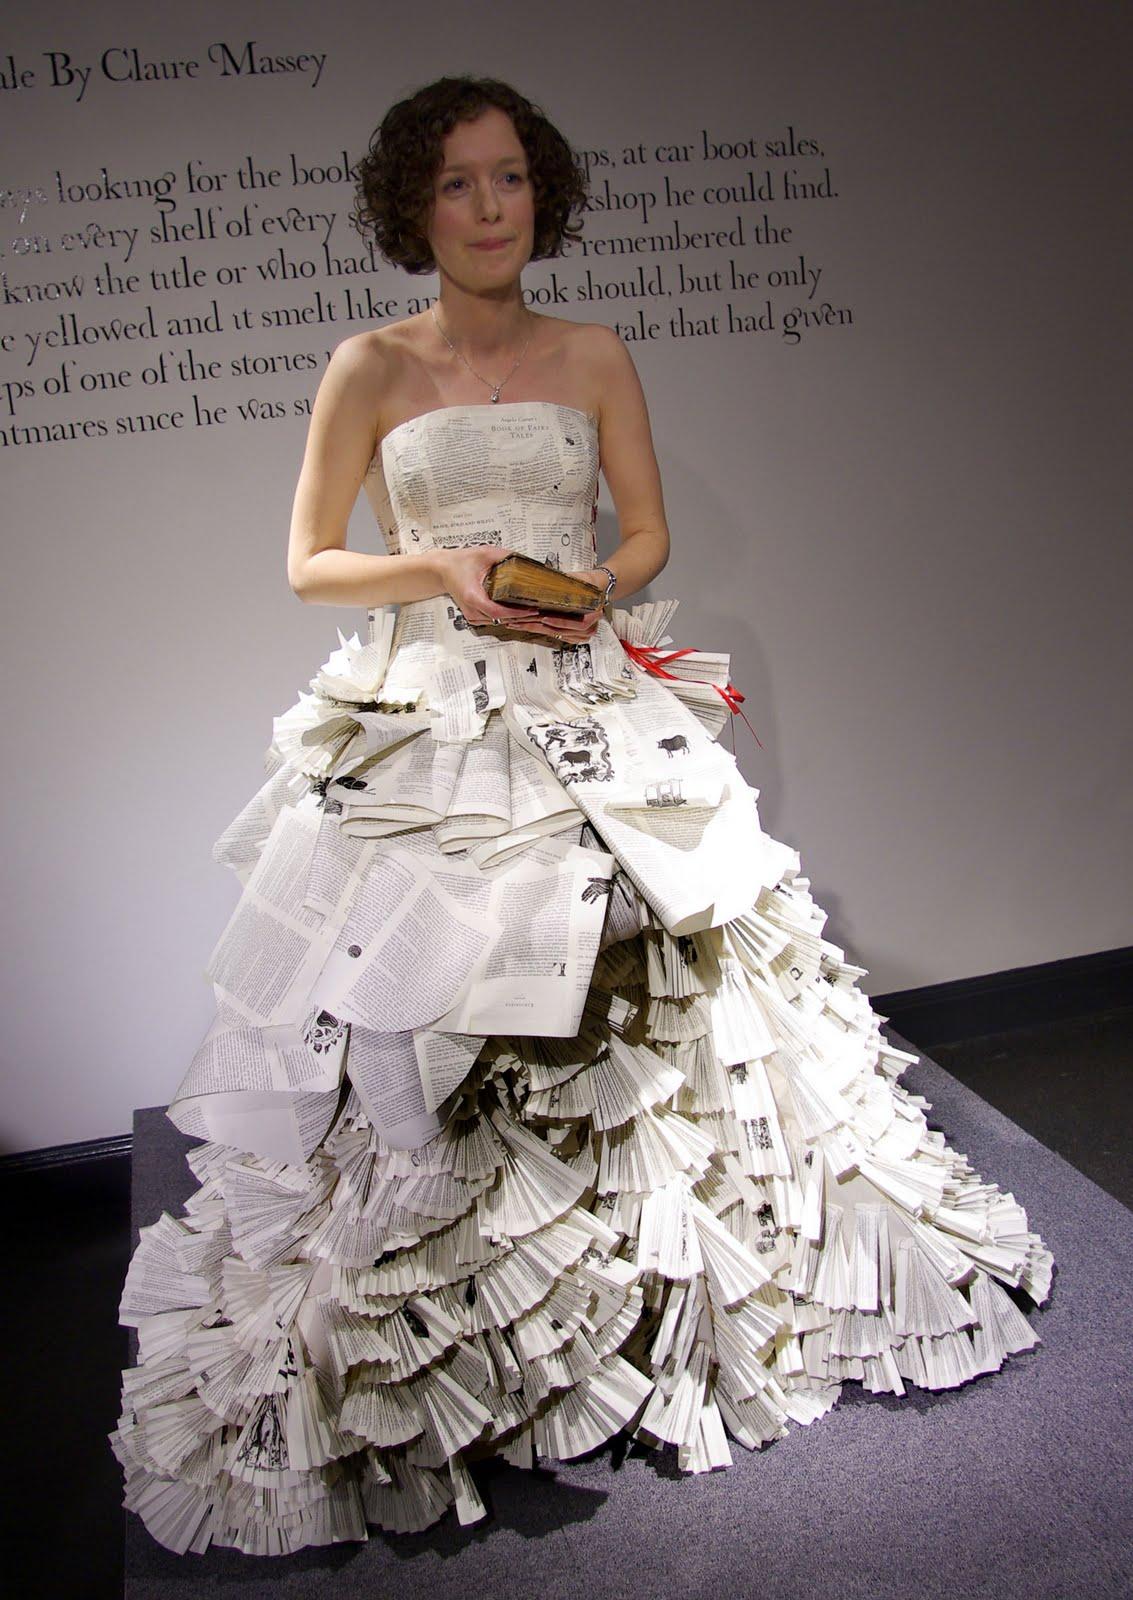 http://4.bp.blogspot.com/-Gg_k5LEfZQo/TiSKb2b_DXI/AAAAAAAAByY/3AakhHChhQU/s1600/fairytale+book+dress.jpg